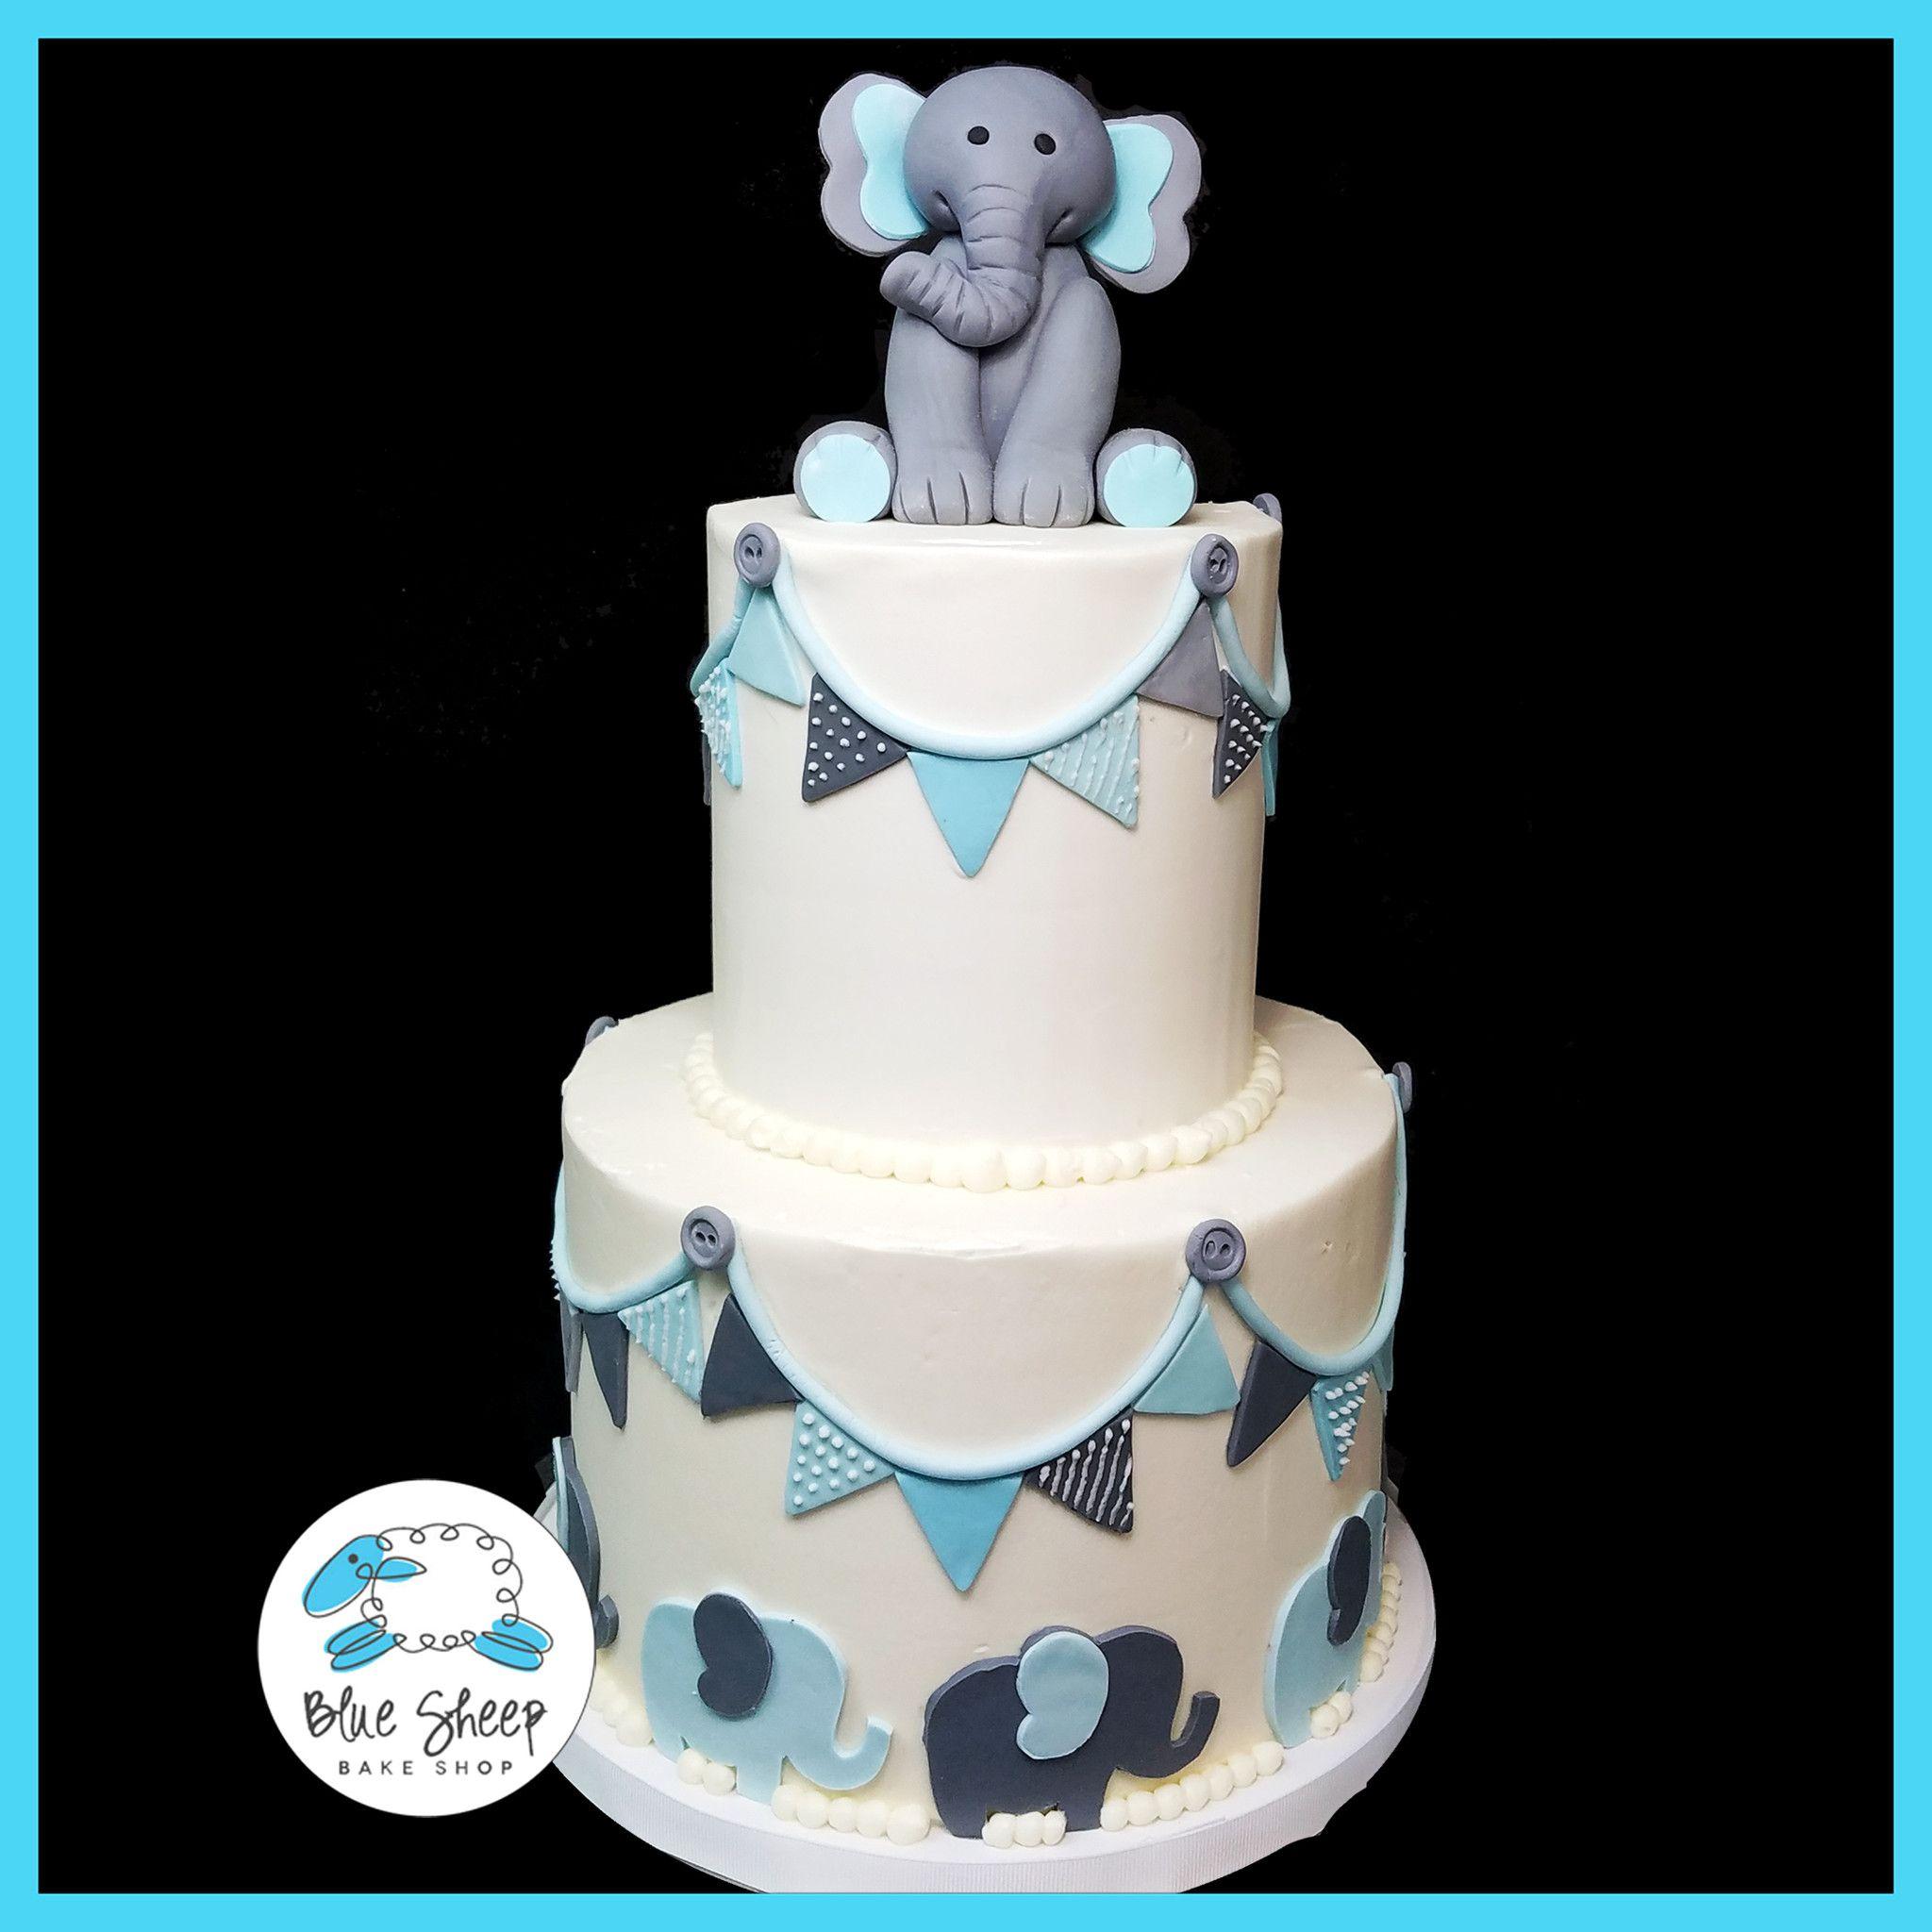 Buttercream Elephant U0026 Flags Baby Shower Cake | Blue Sheep Bake Shop